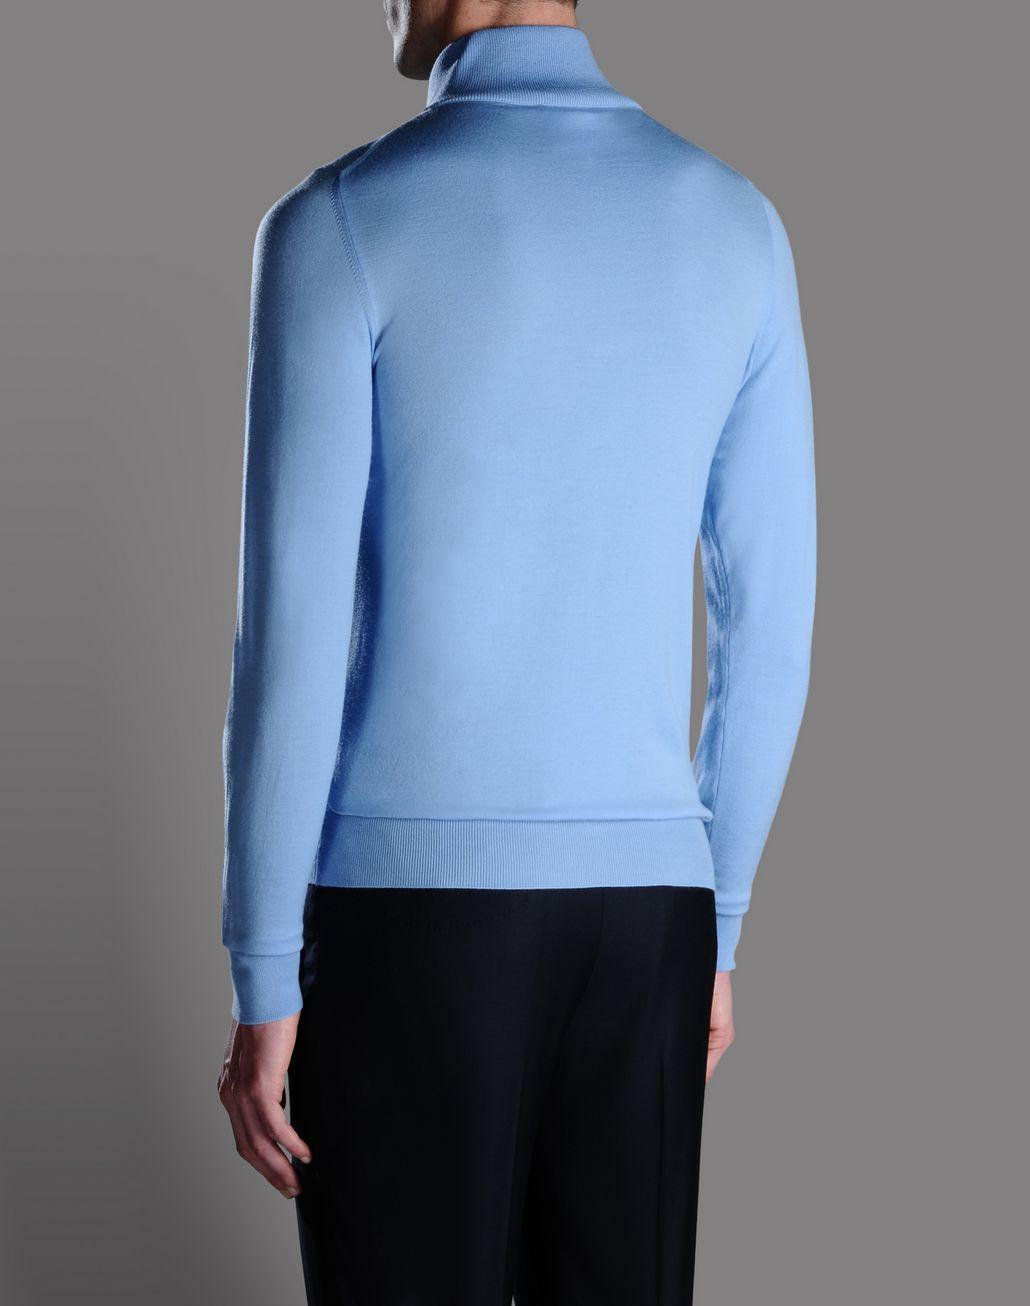 BRIONI ZIP TURTLE NECK Knitwear U r